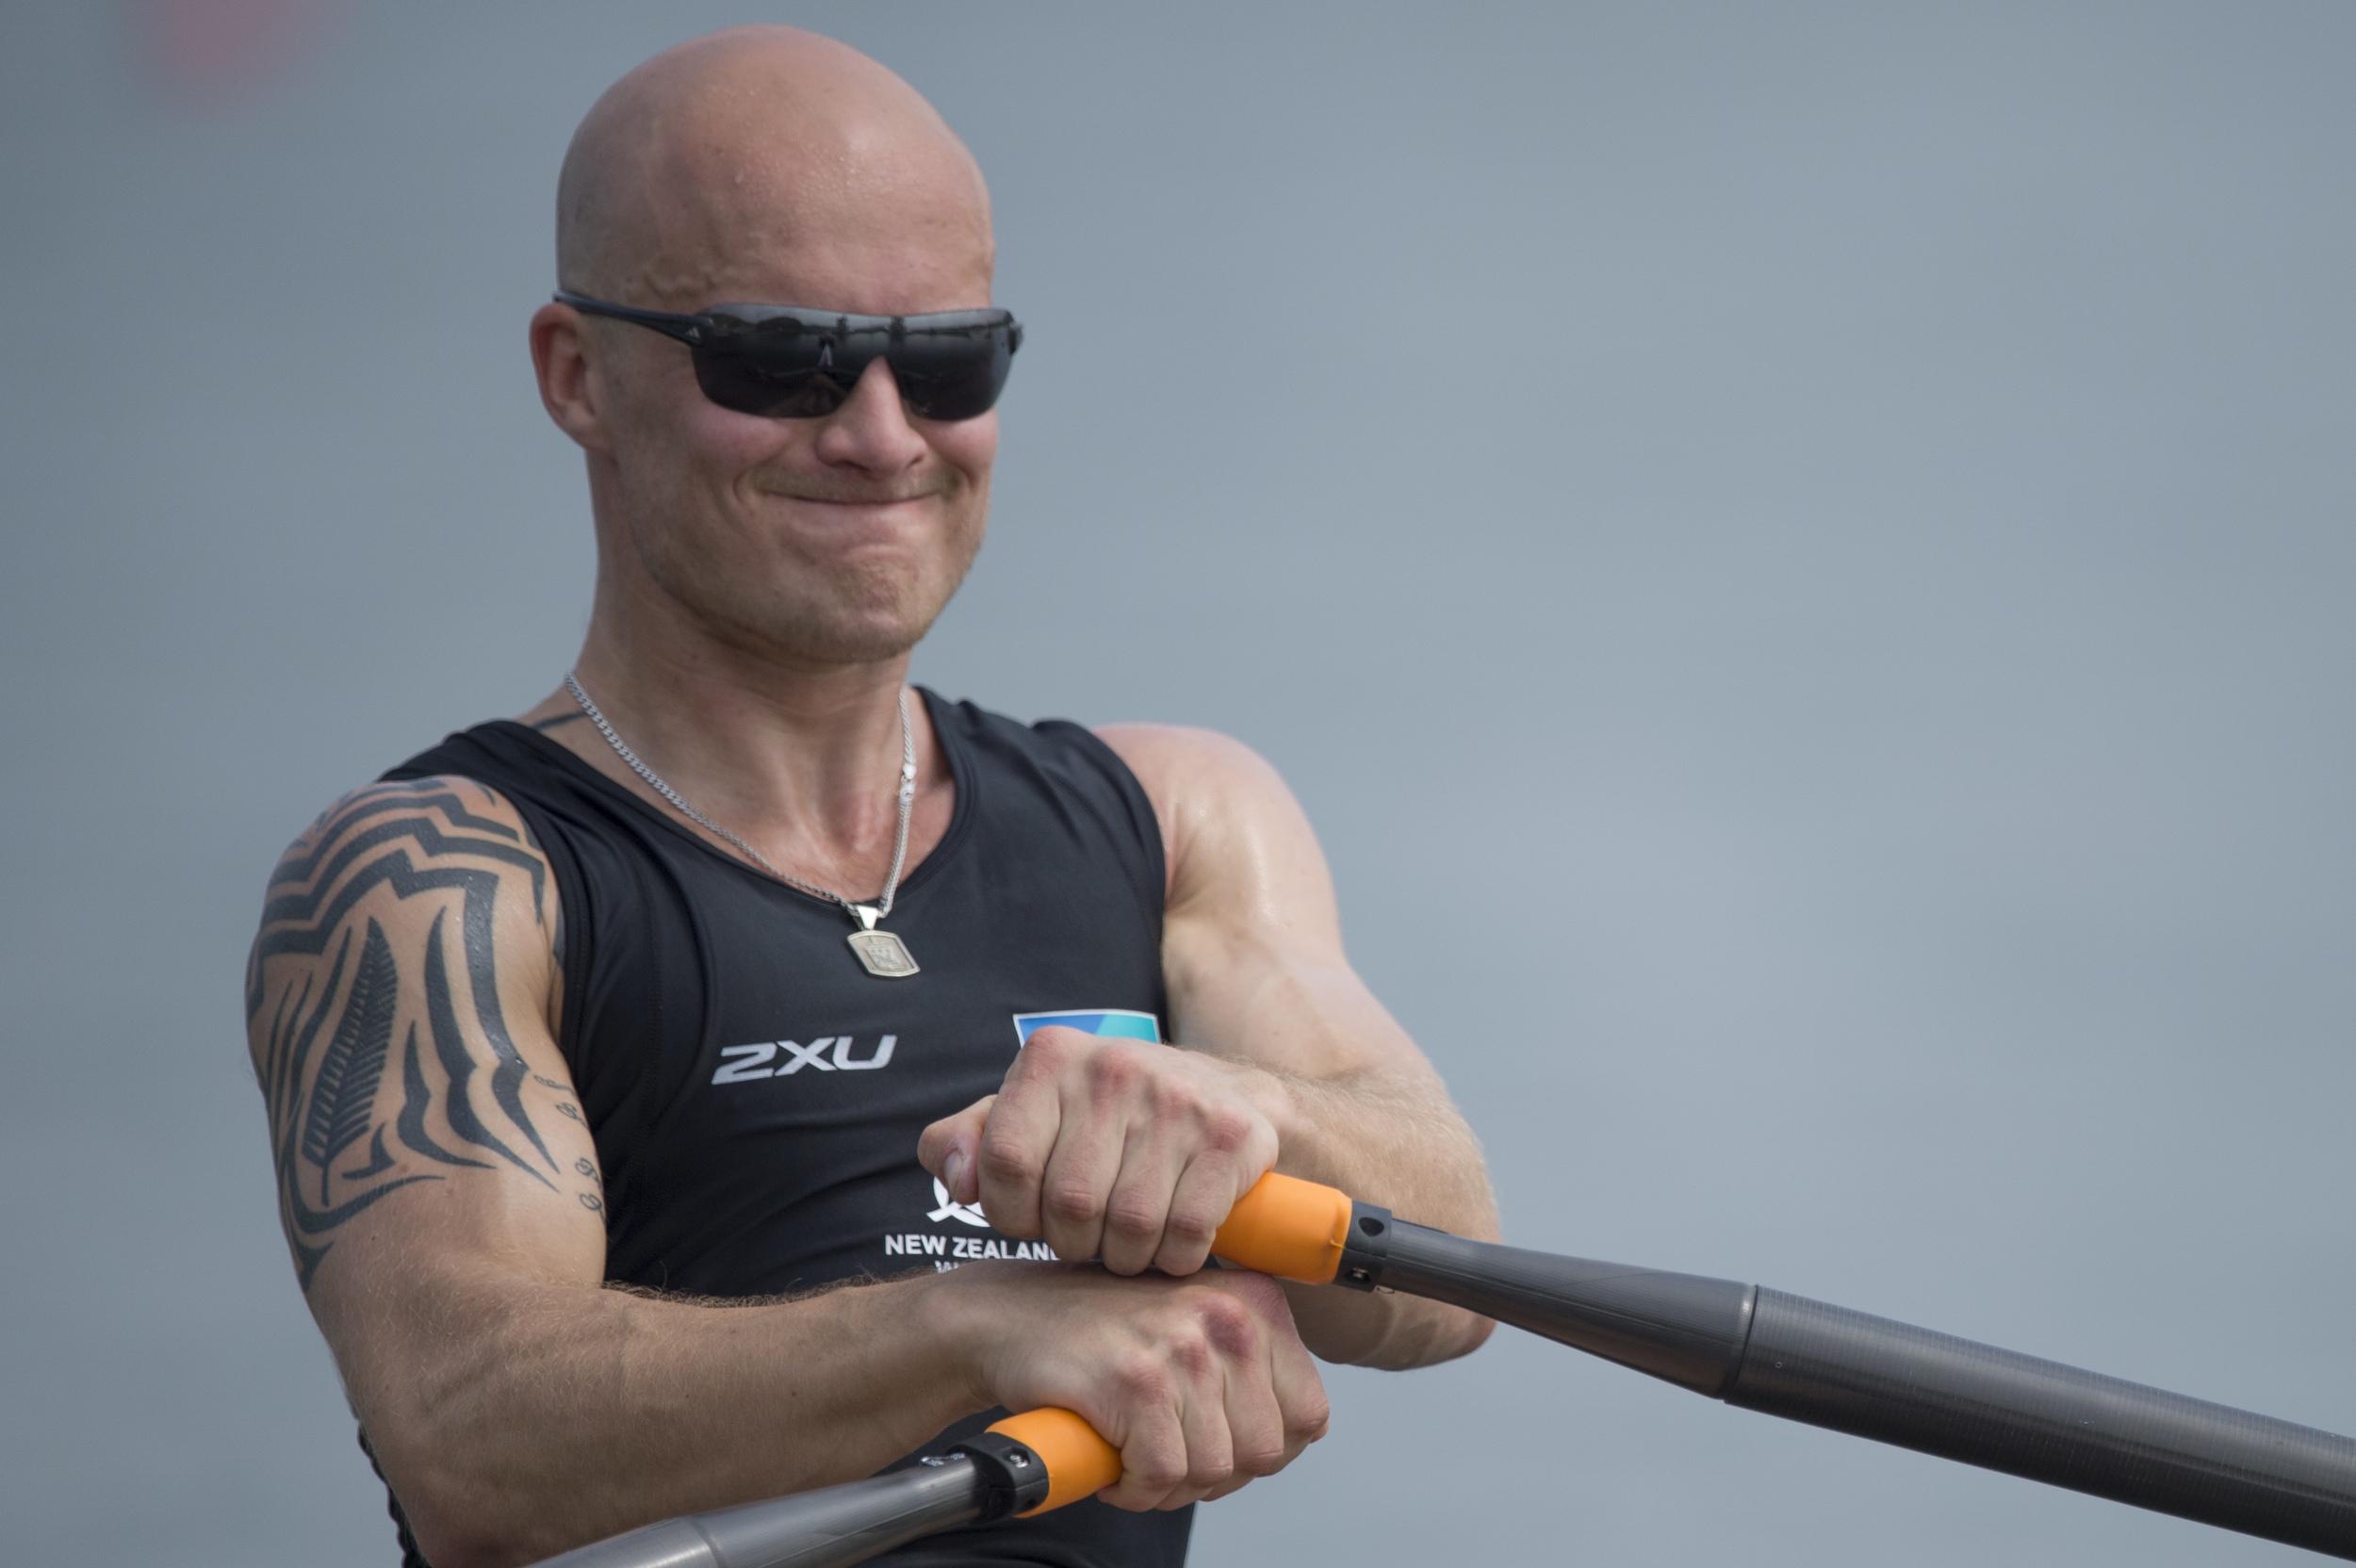 Toby Cunliffe-Steel - 2015 World University Games - Semi final - Photo © Rowing Celebration (4).jpg